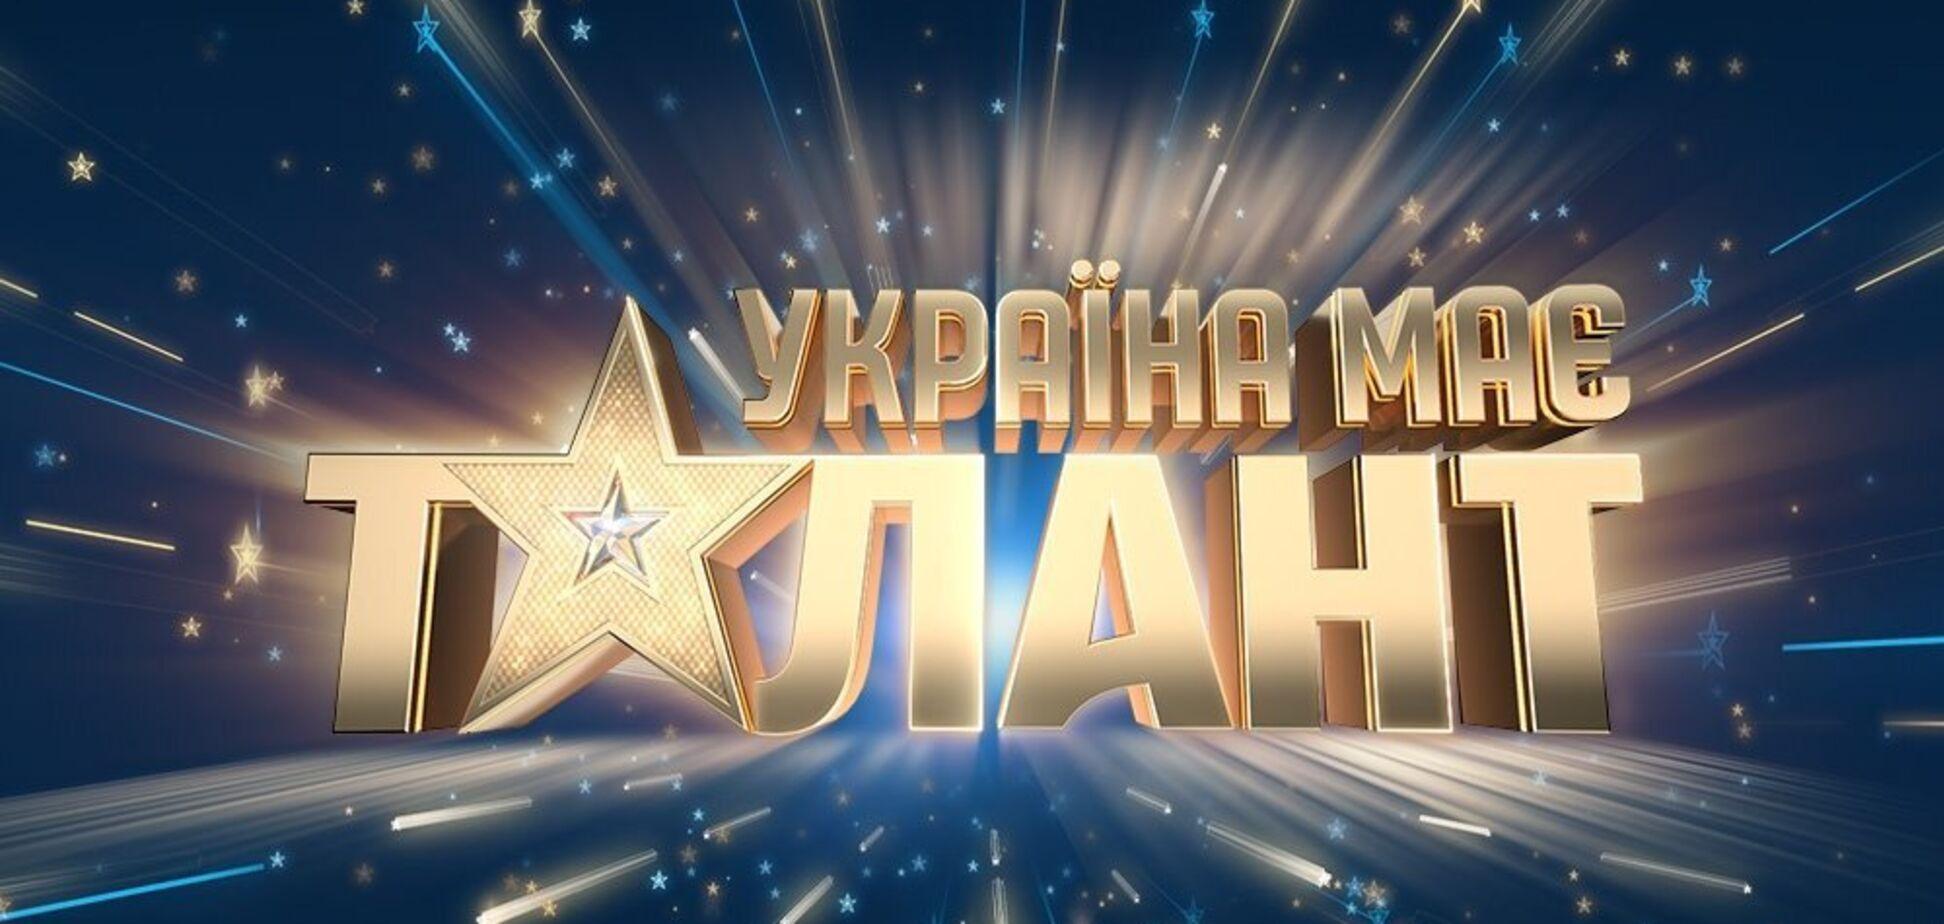 Названы имена судей шоу 'Україна має талант'